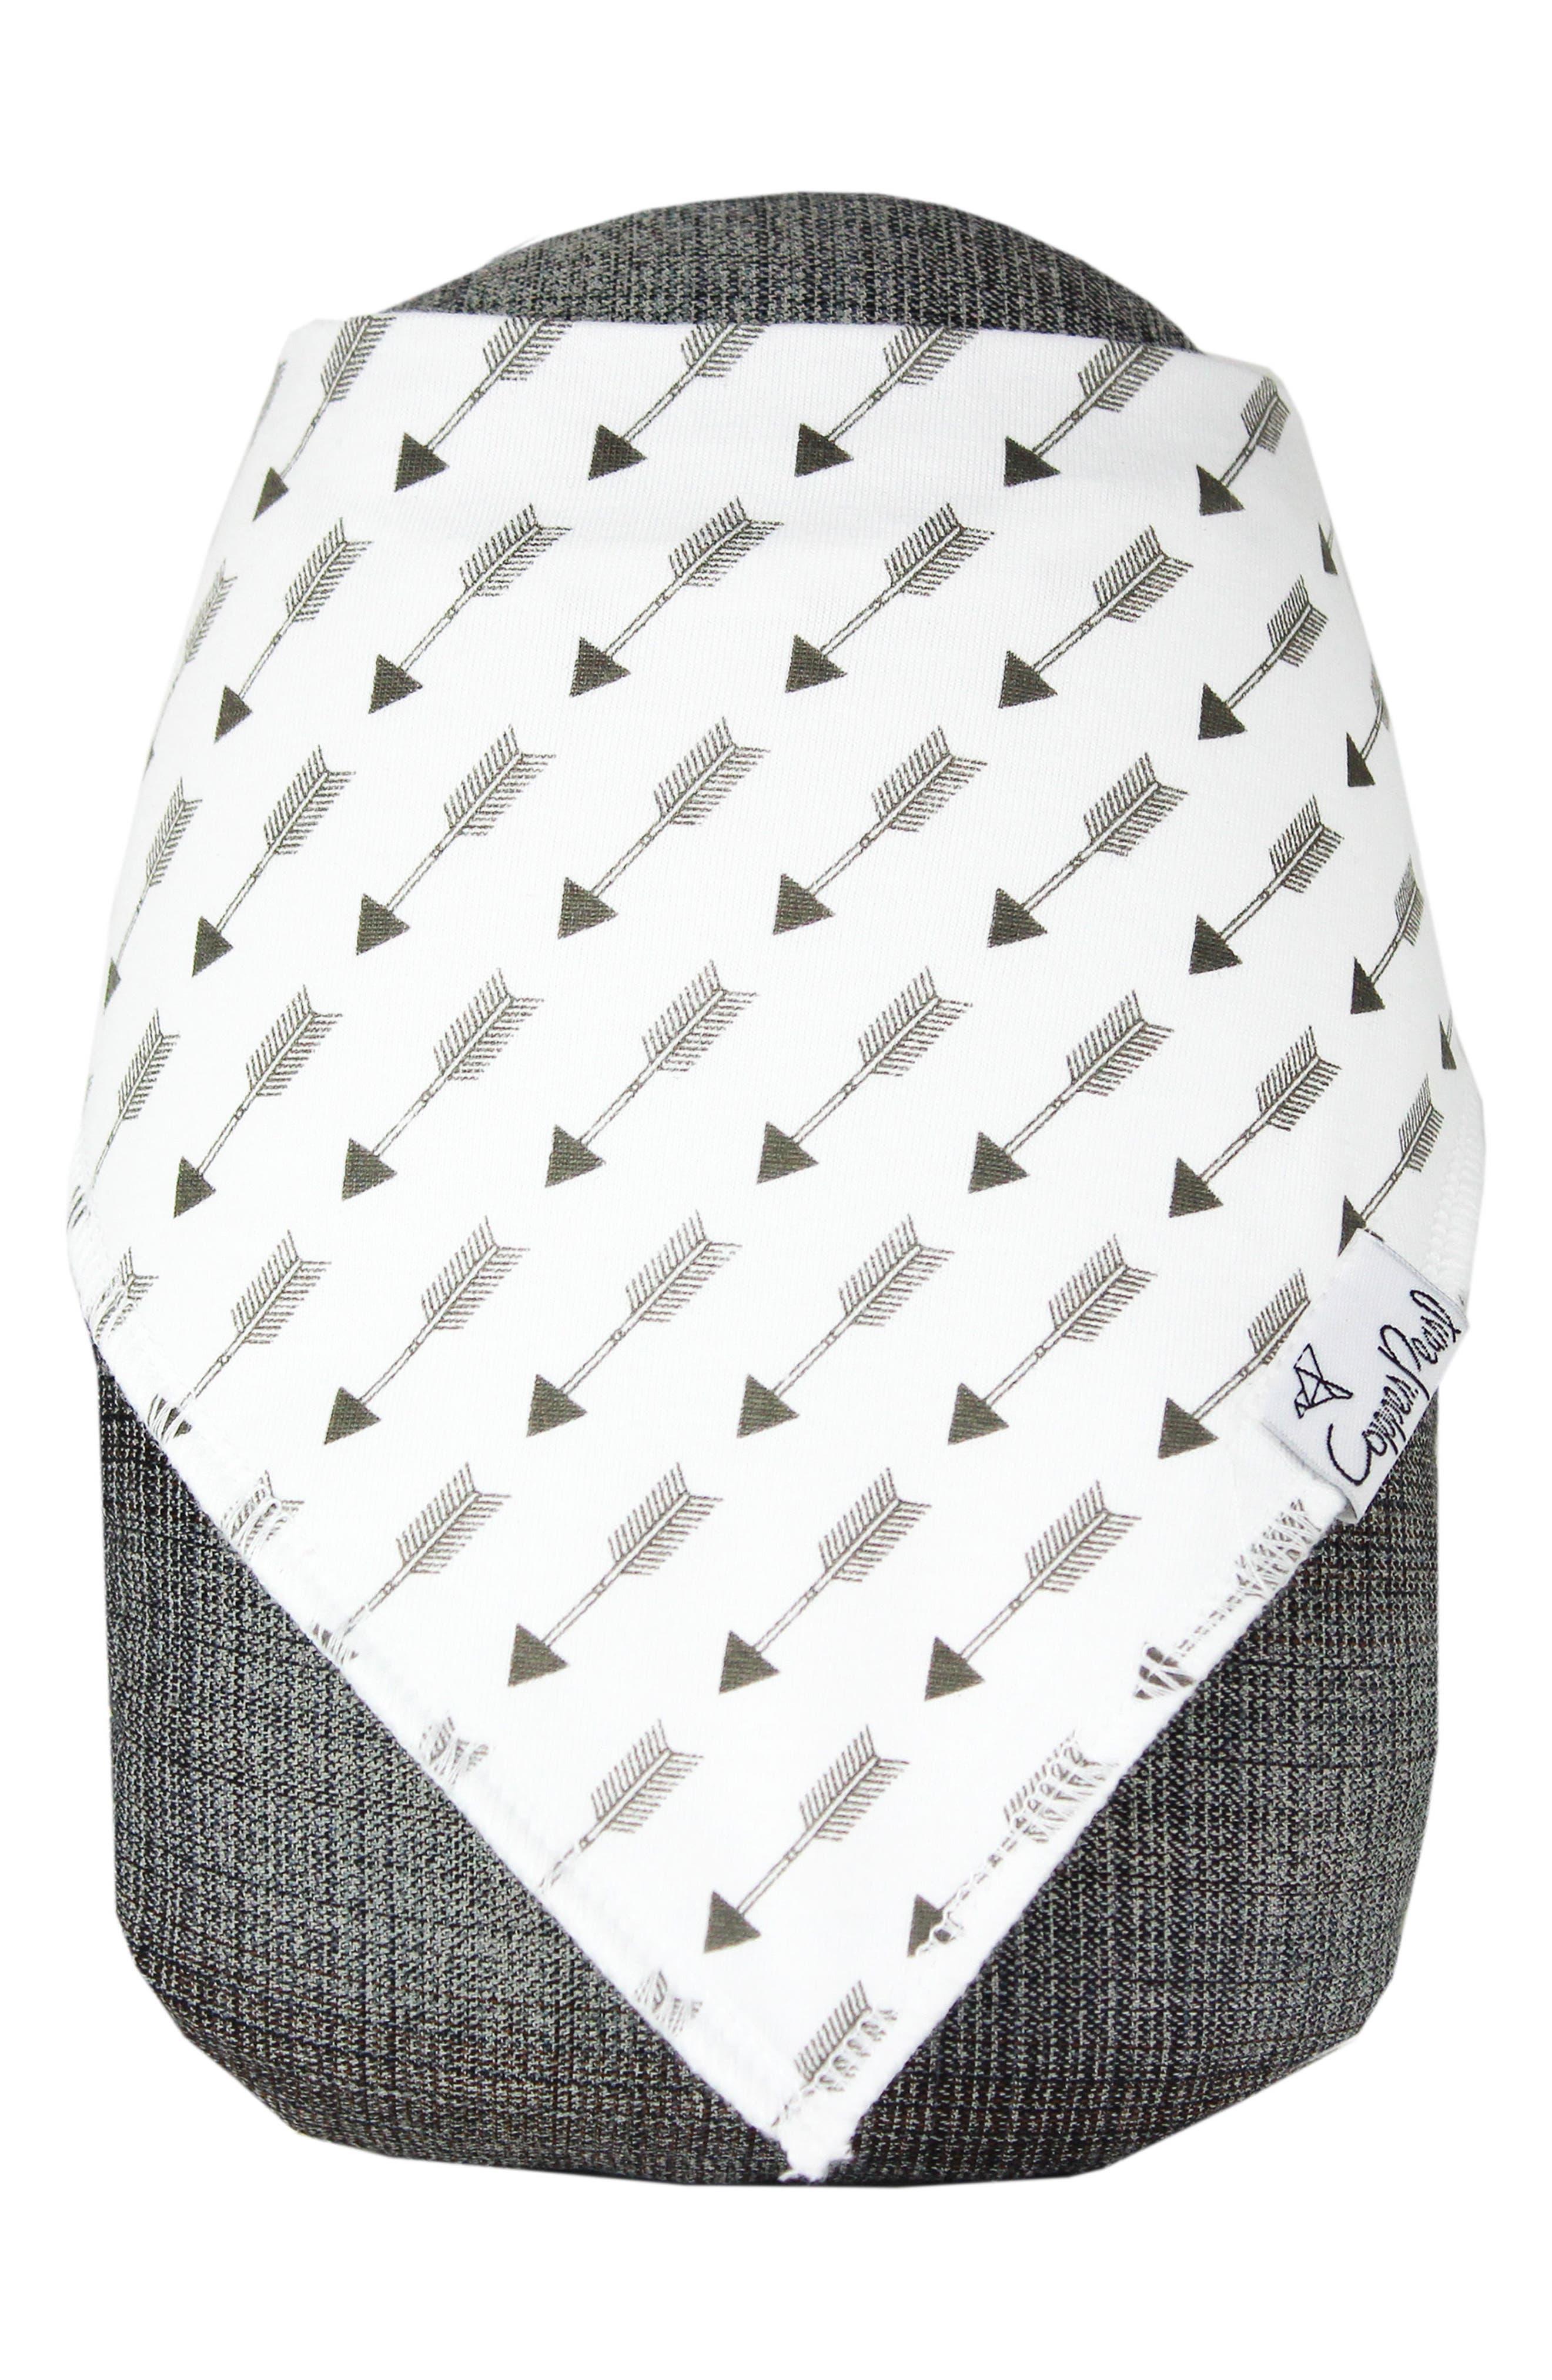 Summit Bib, Multiuse Cover & Swaddle Blanket Gift Set,                             Alternate thumbnail 54, color,                             Summit